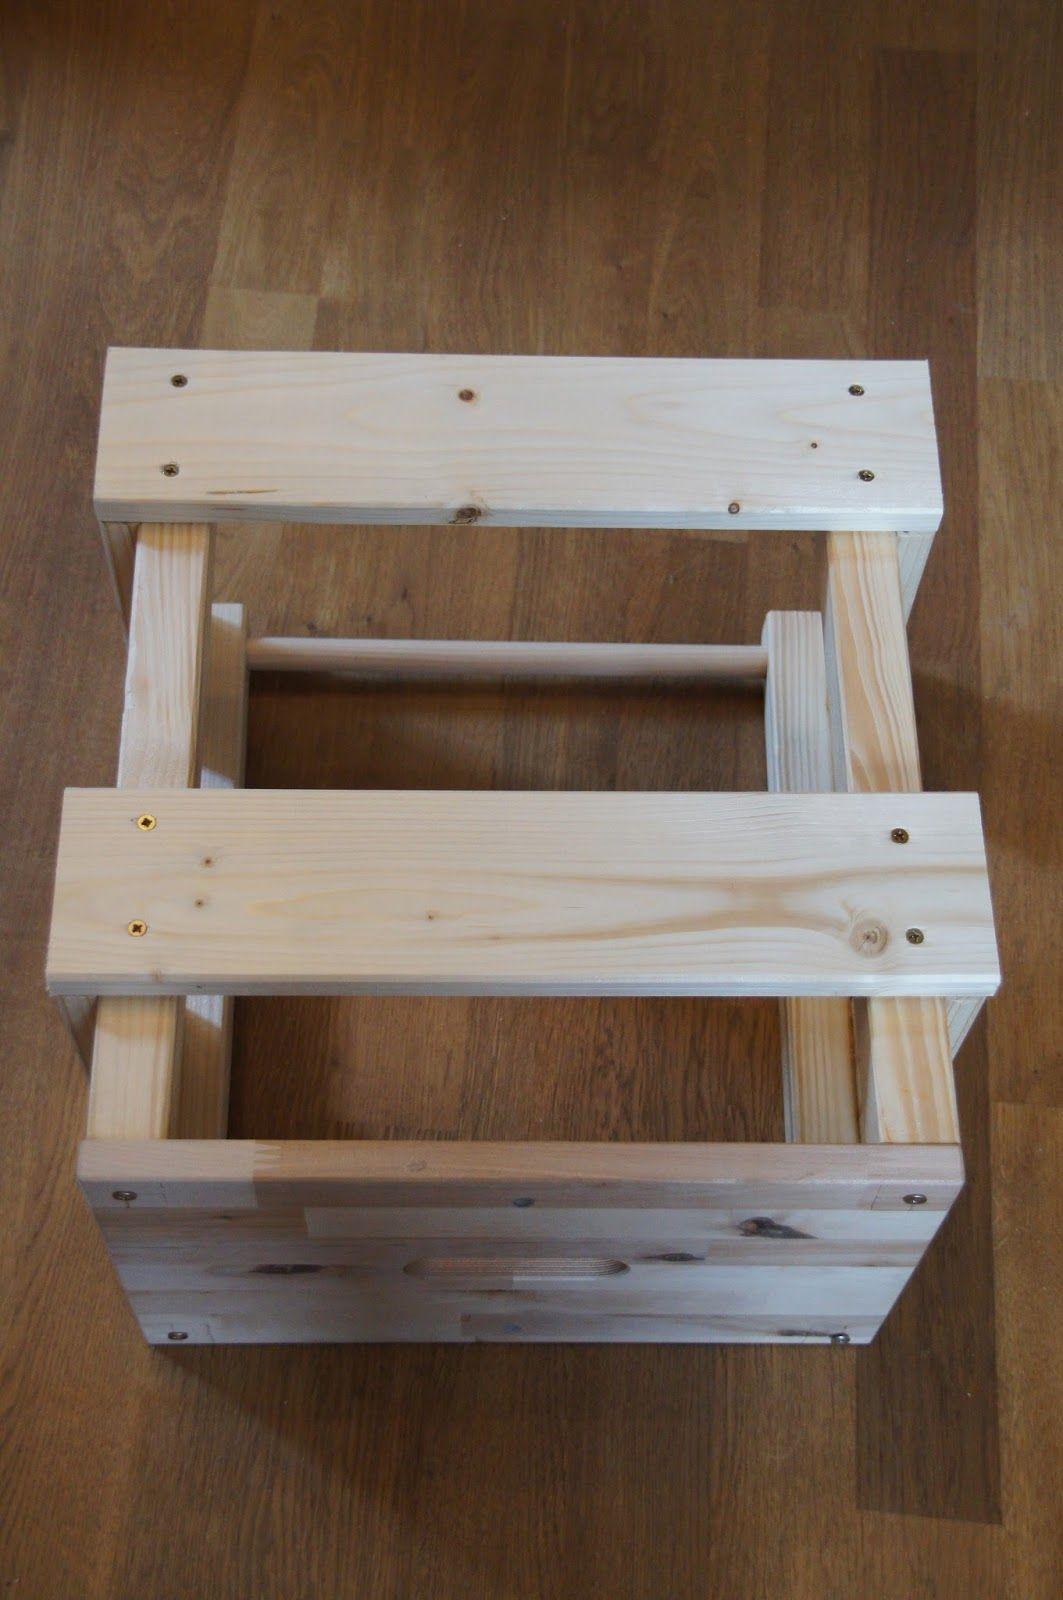 gl cksfl gel bauanleitung f r einen learning tower lernturm aus ikea hocker bekv m bekv m. Black Bedroom Furniture Sets. Home Design Ideas